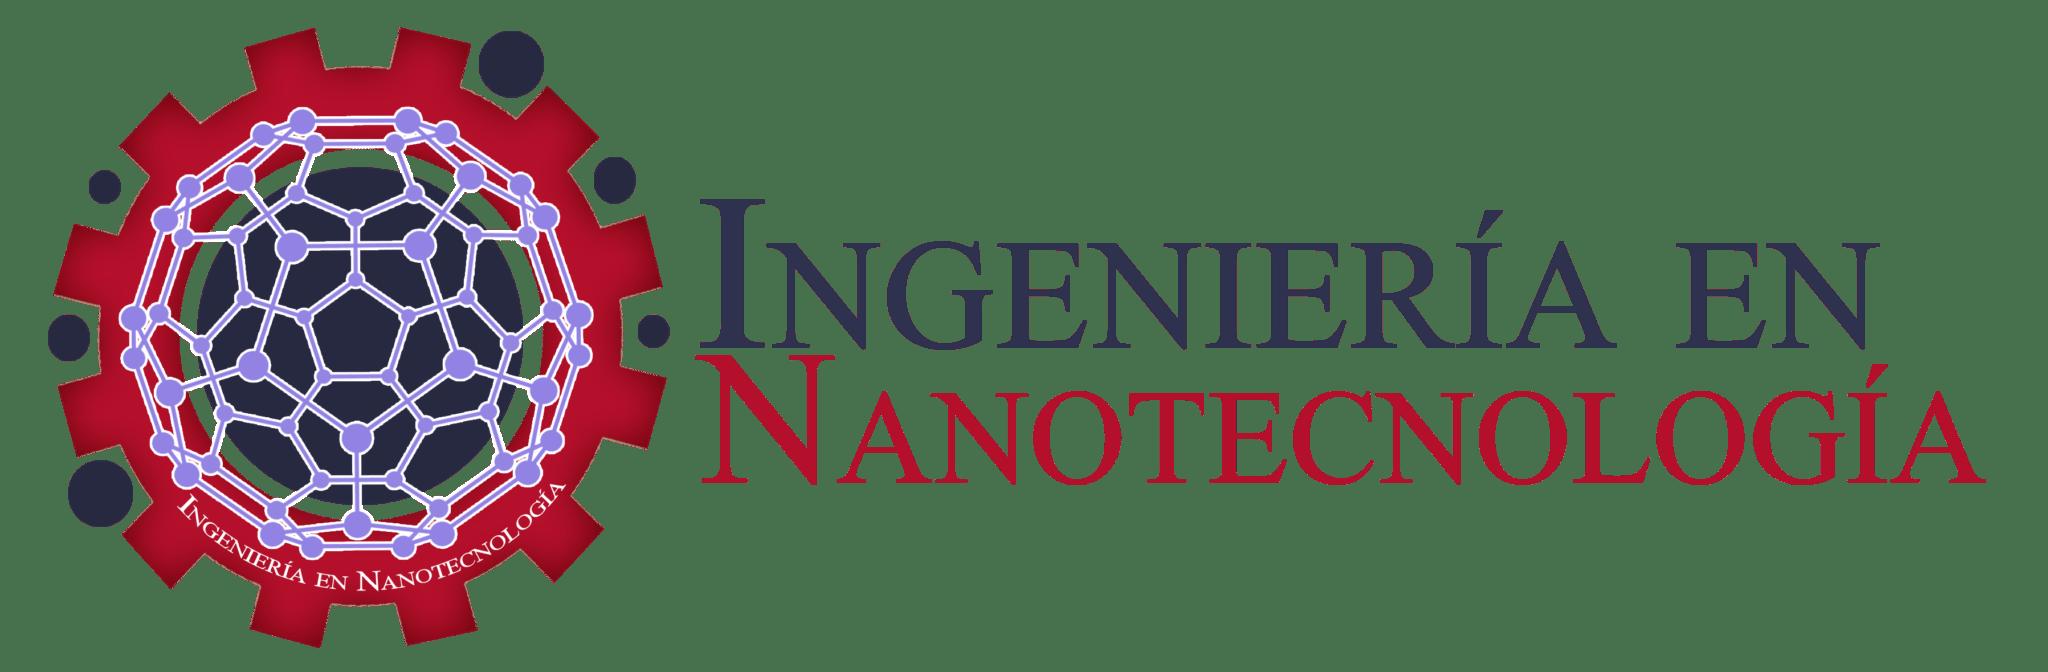 Heading Ing en nanotecnologia